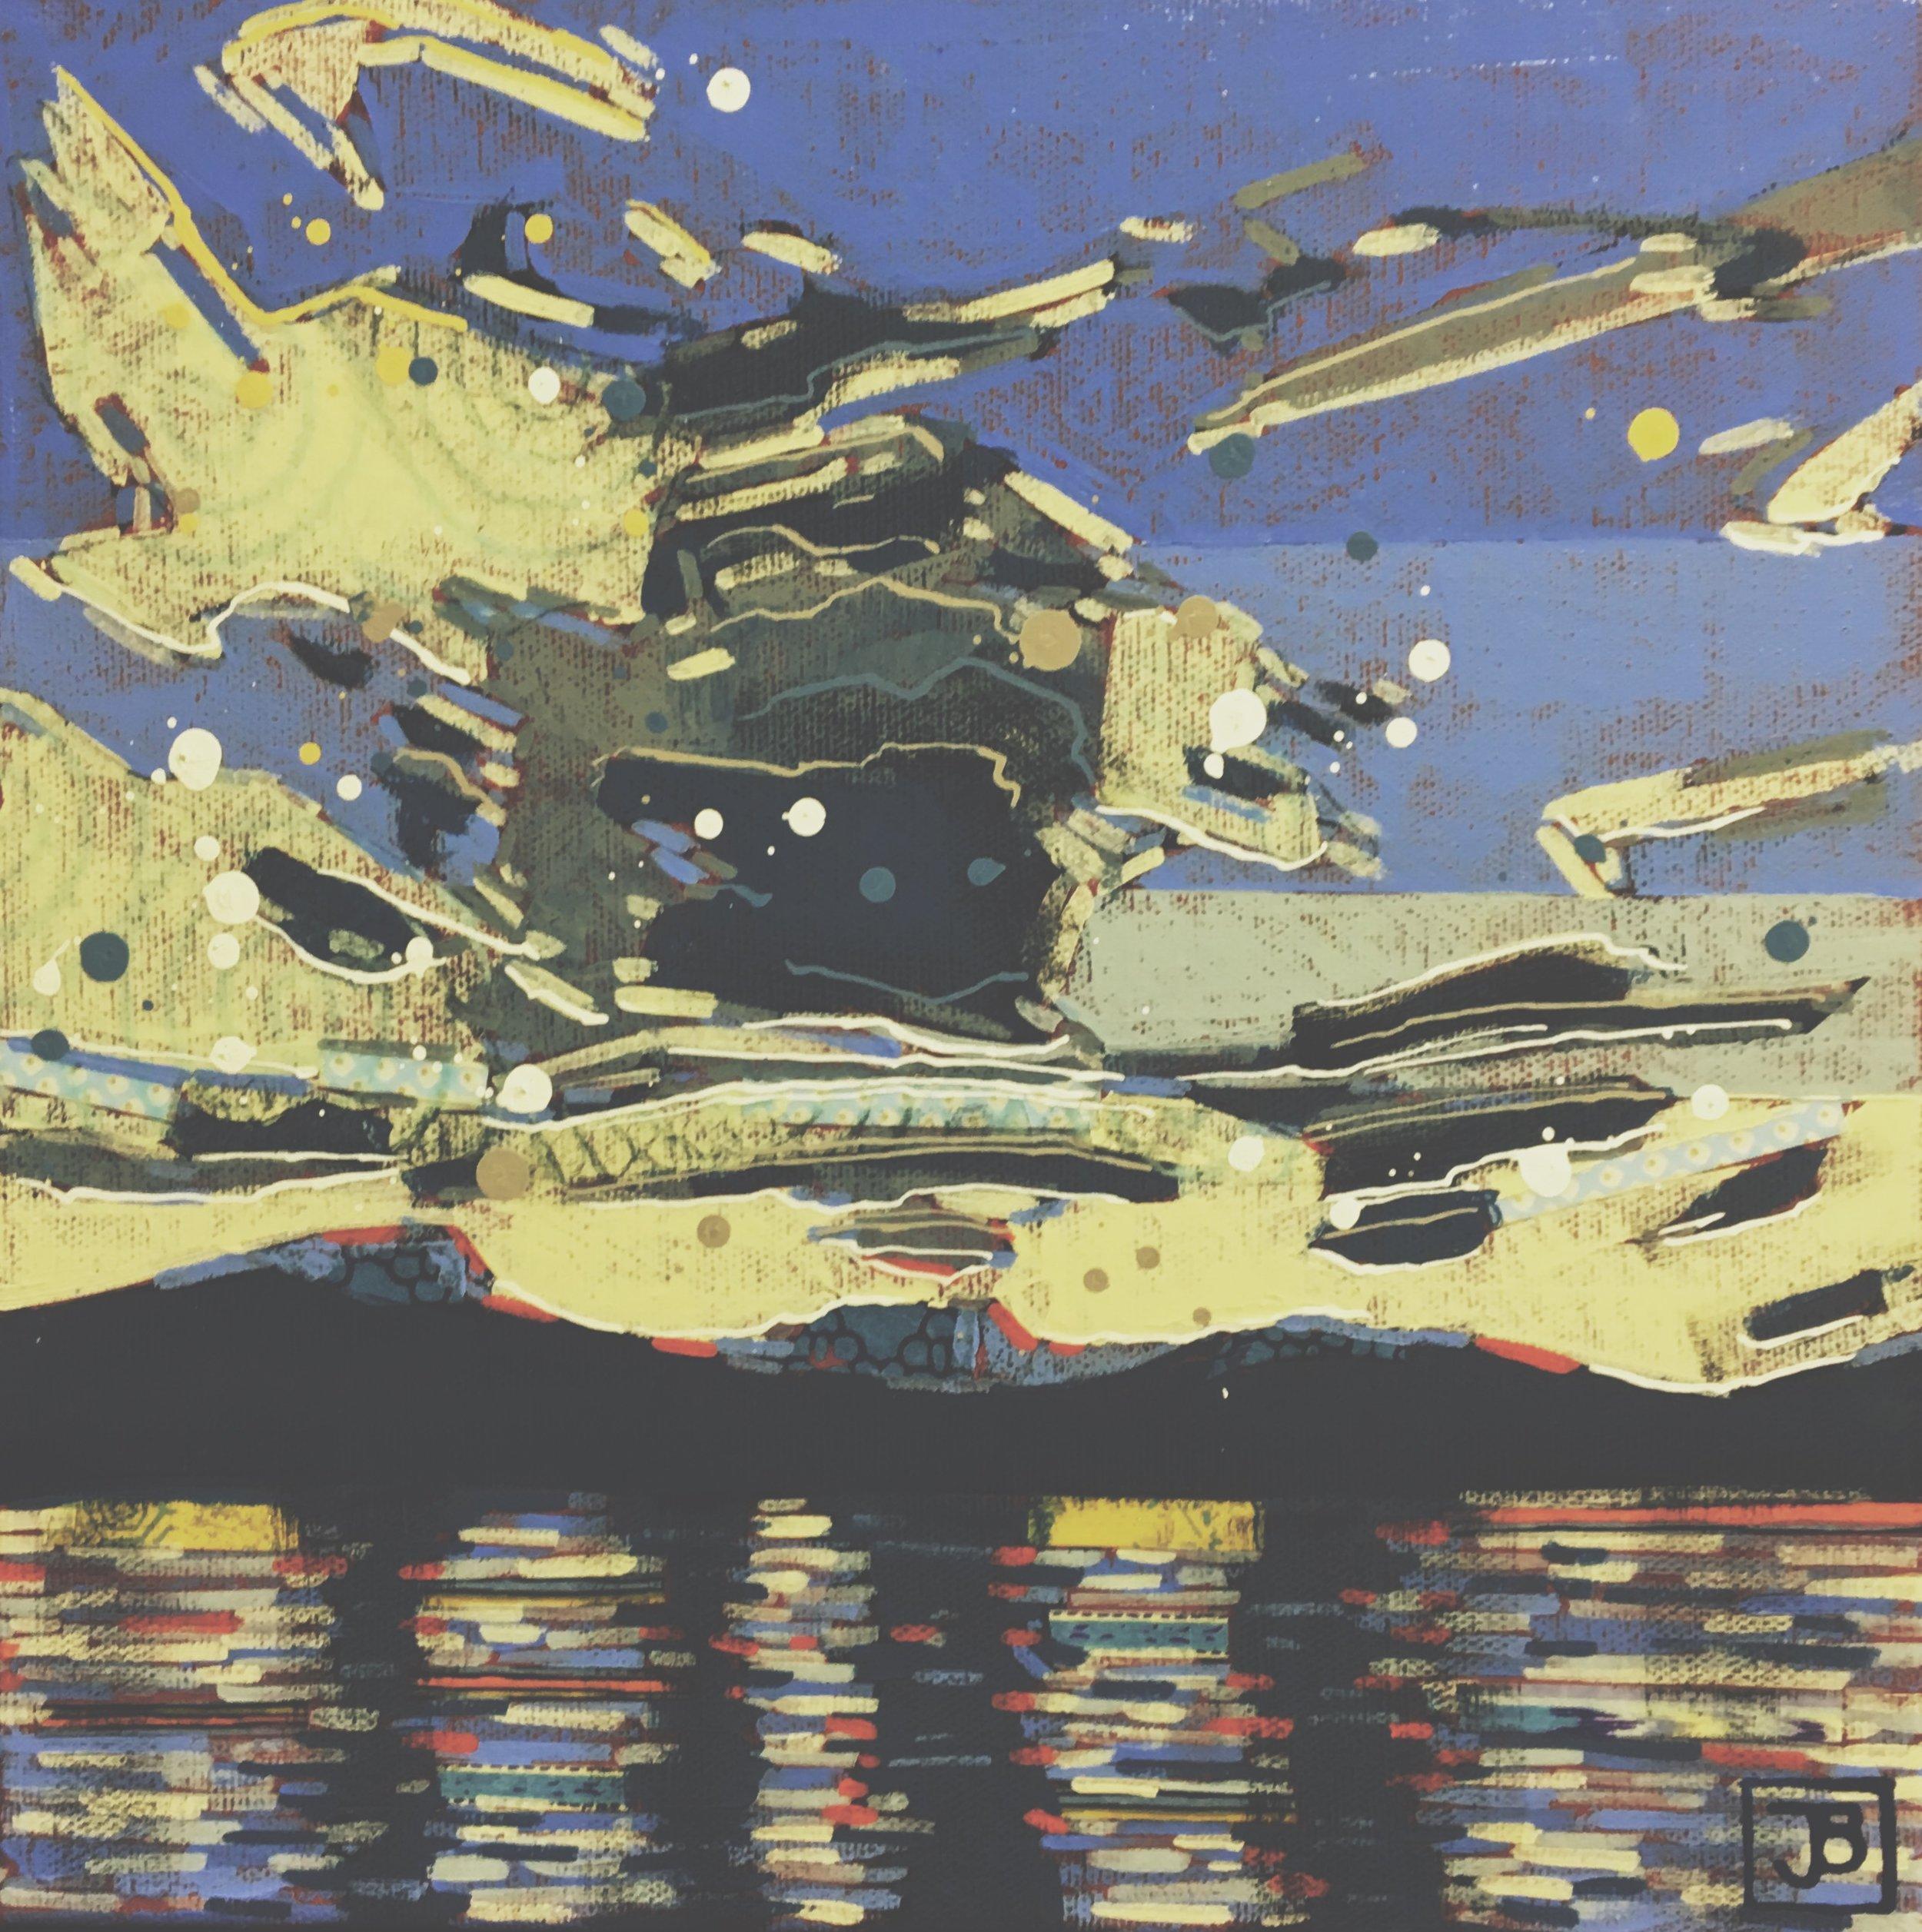 sunset, maligne lake, jasper national park,  mixed media on canvas, 10x10(in), $200 + GST,  2018